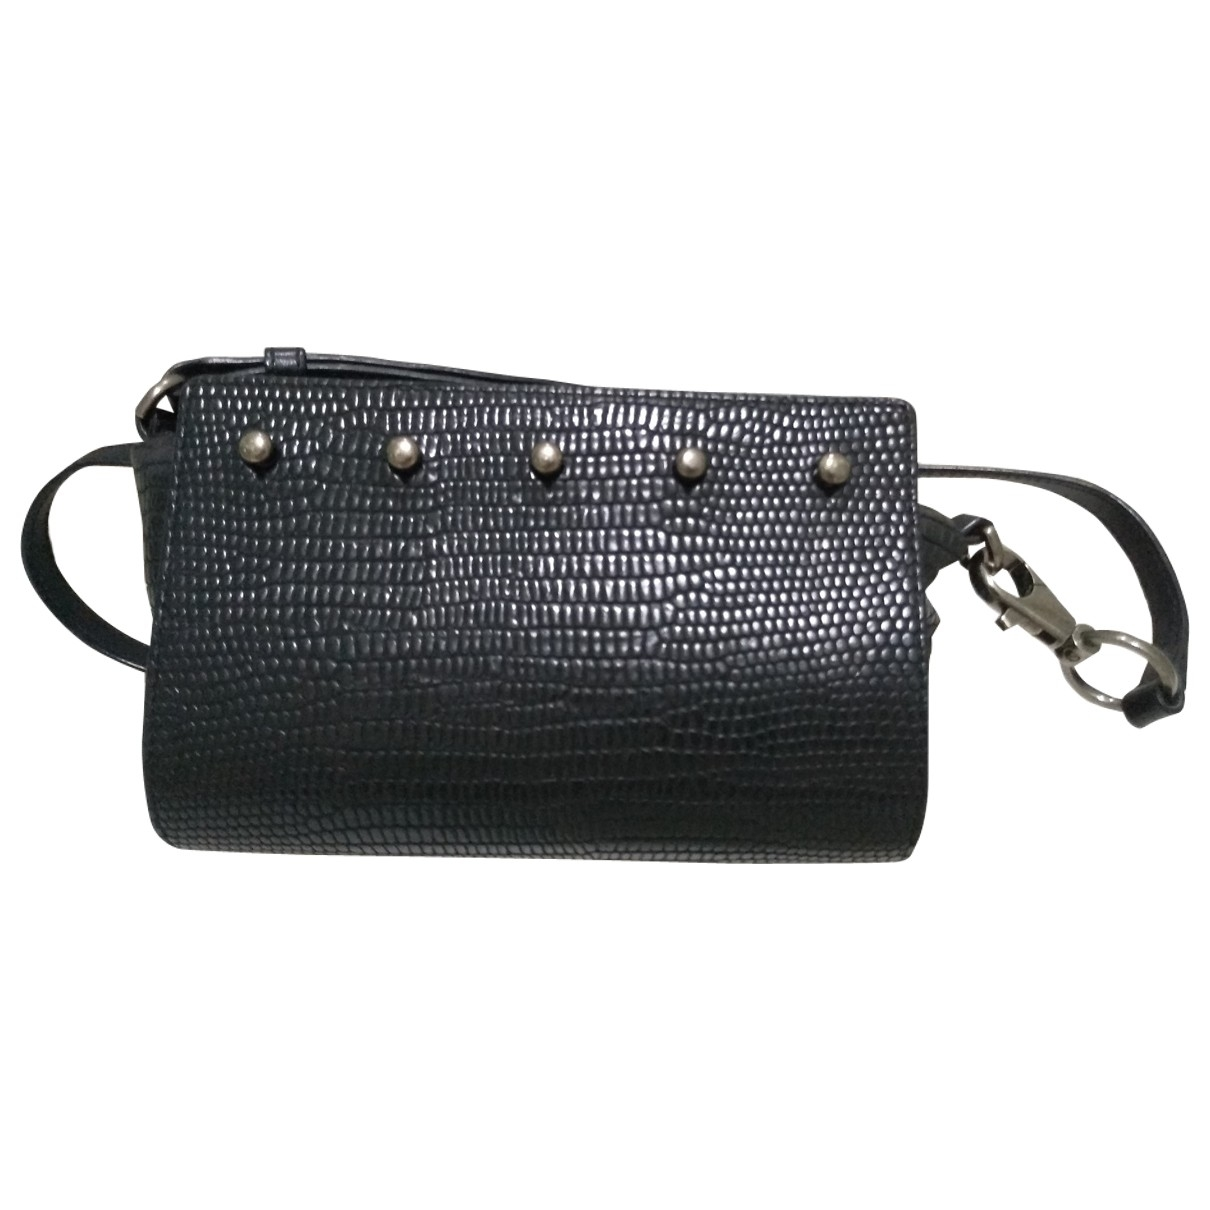 Alexander Wang Prisma Handtasche in  Schwarz Leder